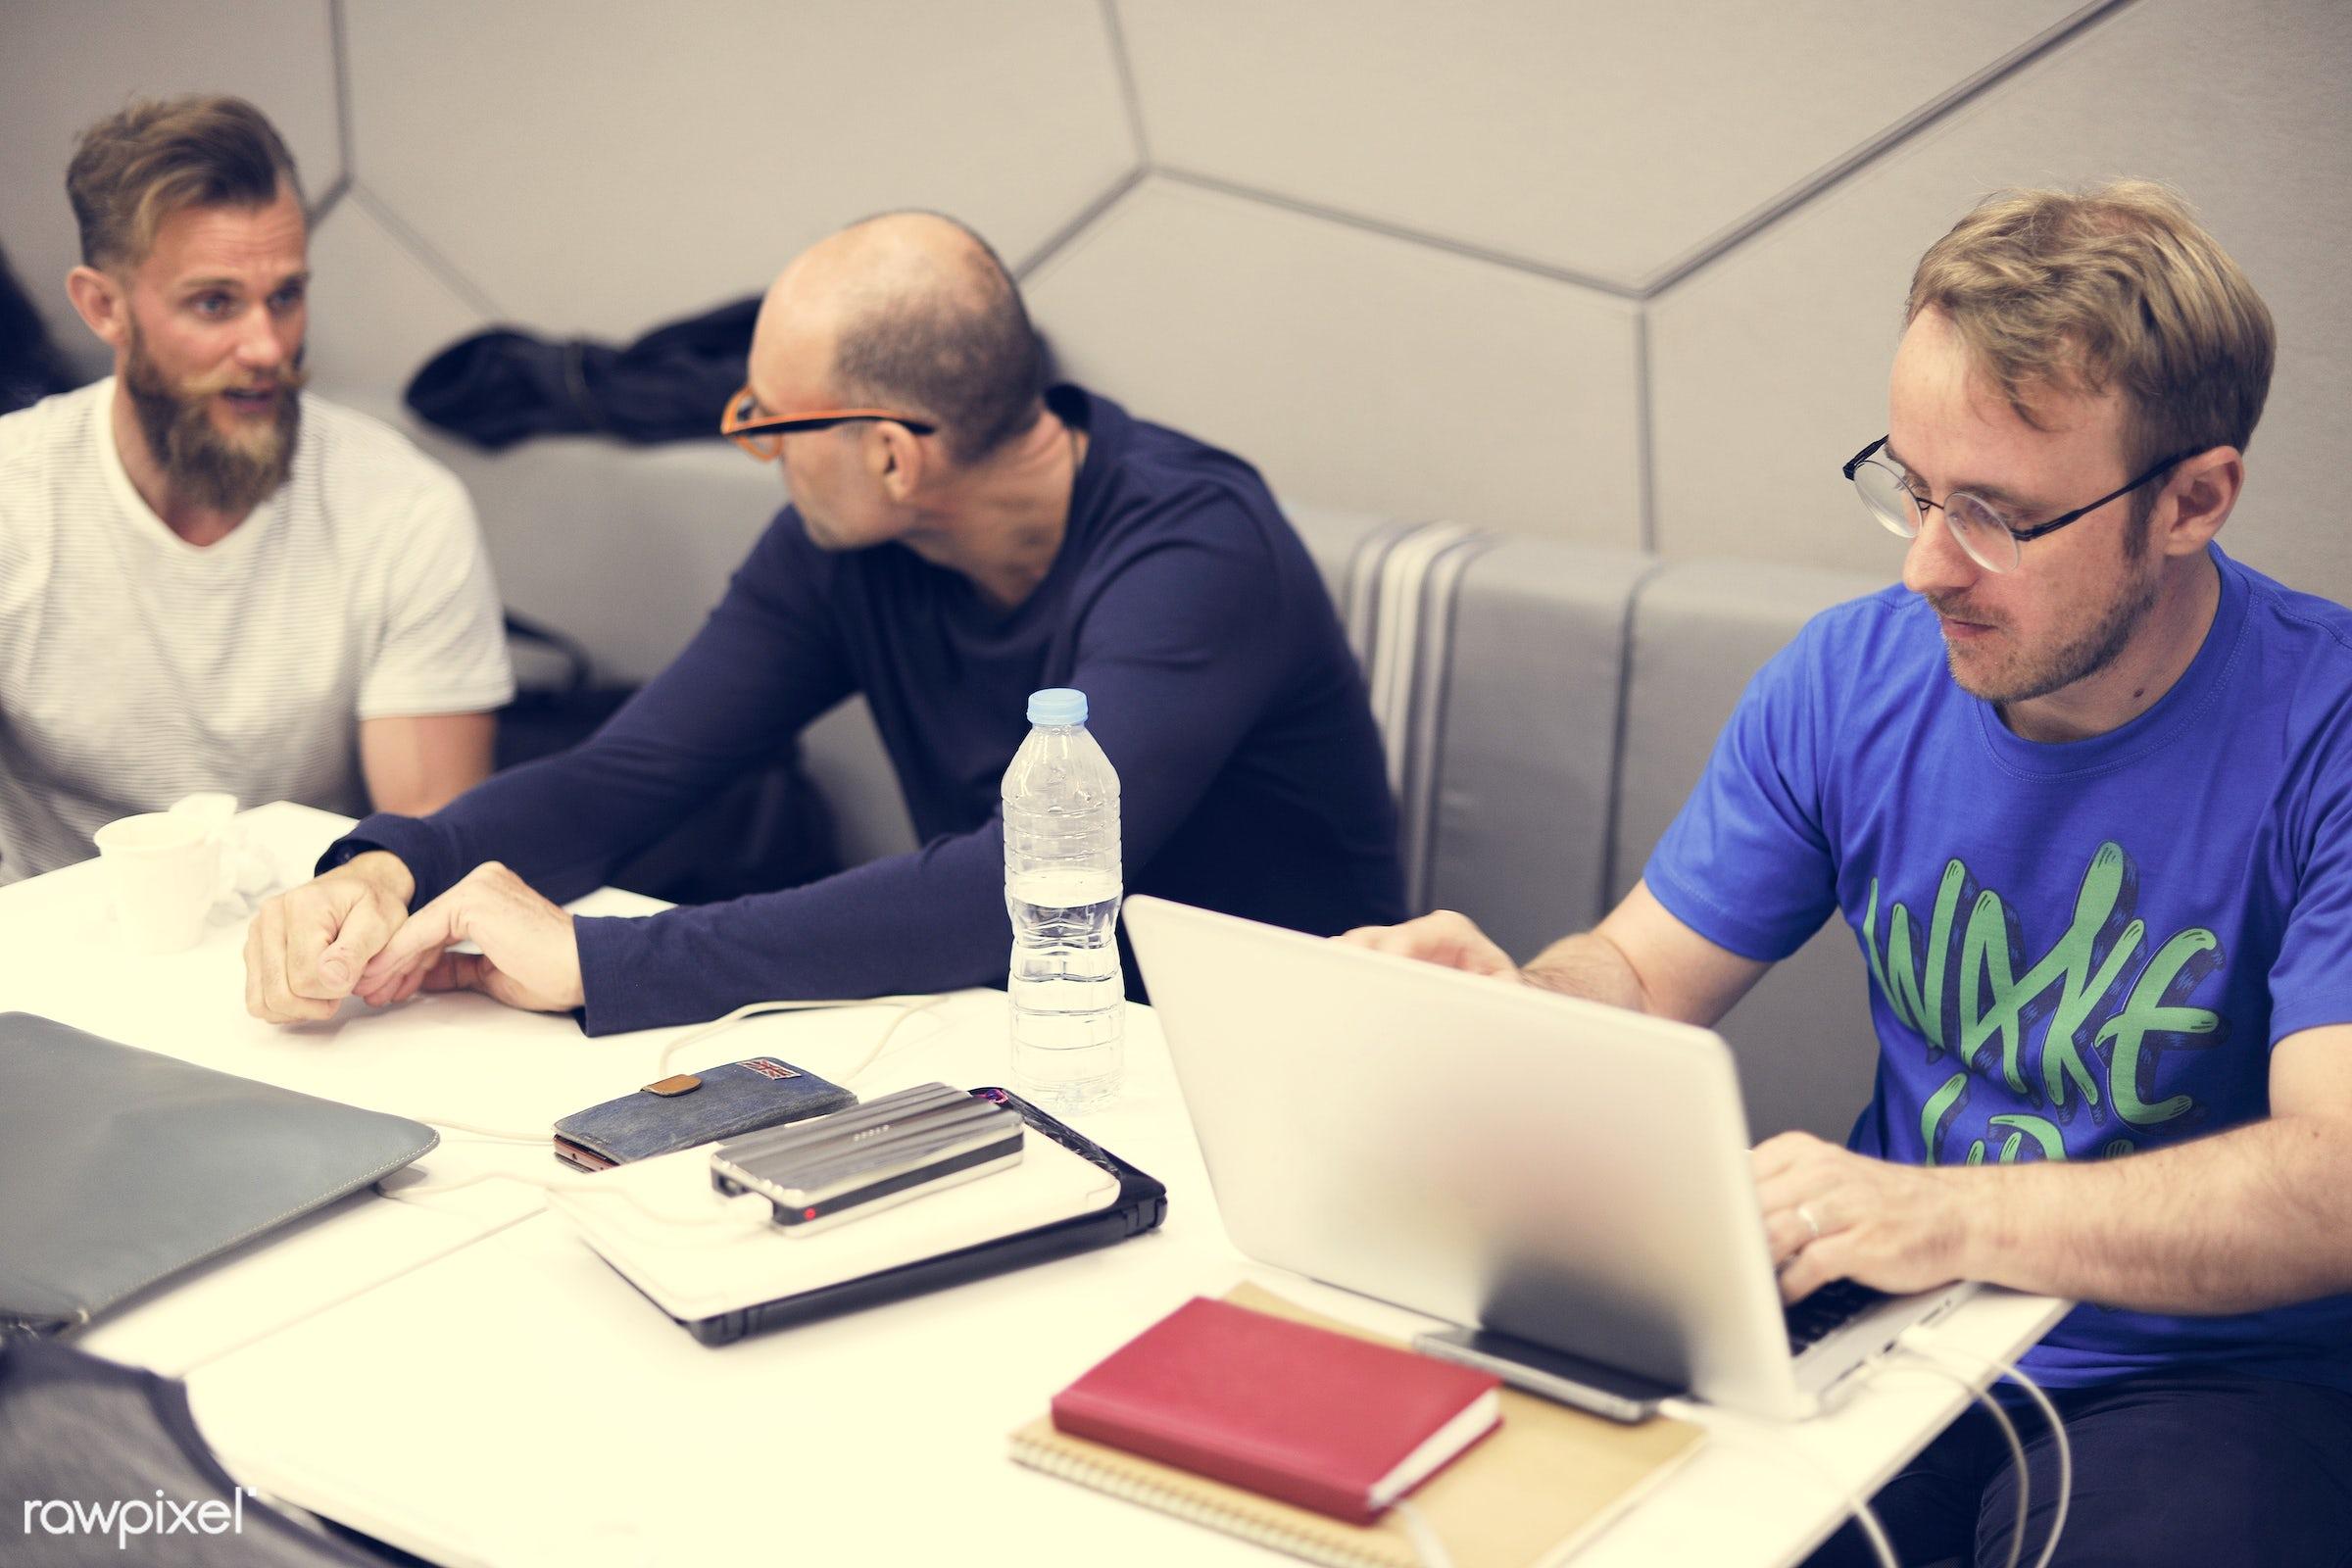 brainstorming, business, computer, device, digital, digital devices, diverse, diversity, group, ideas, laptop, meeting, men...